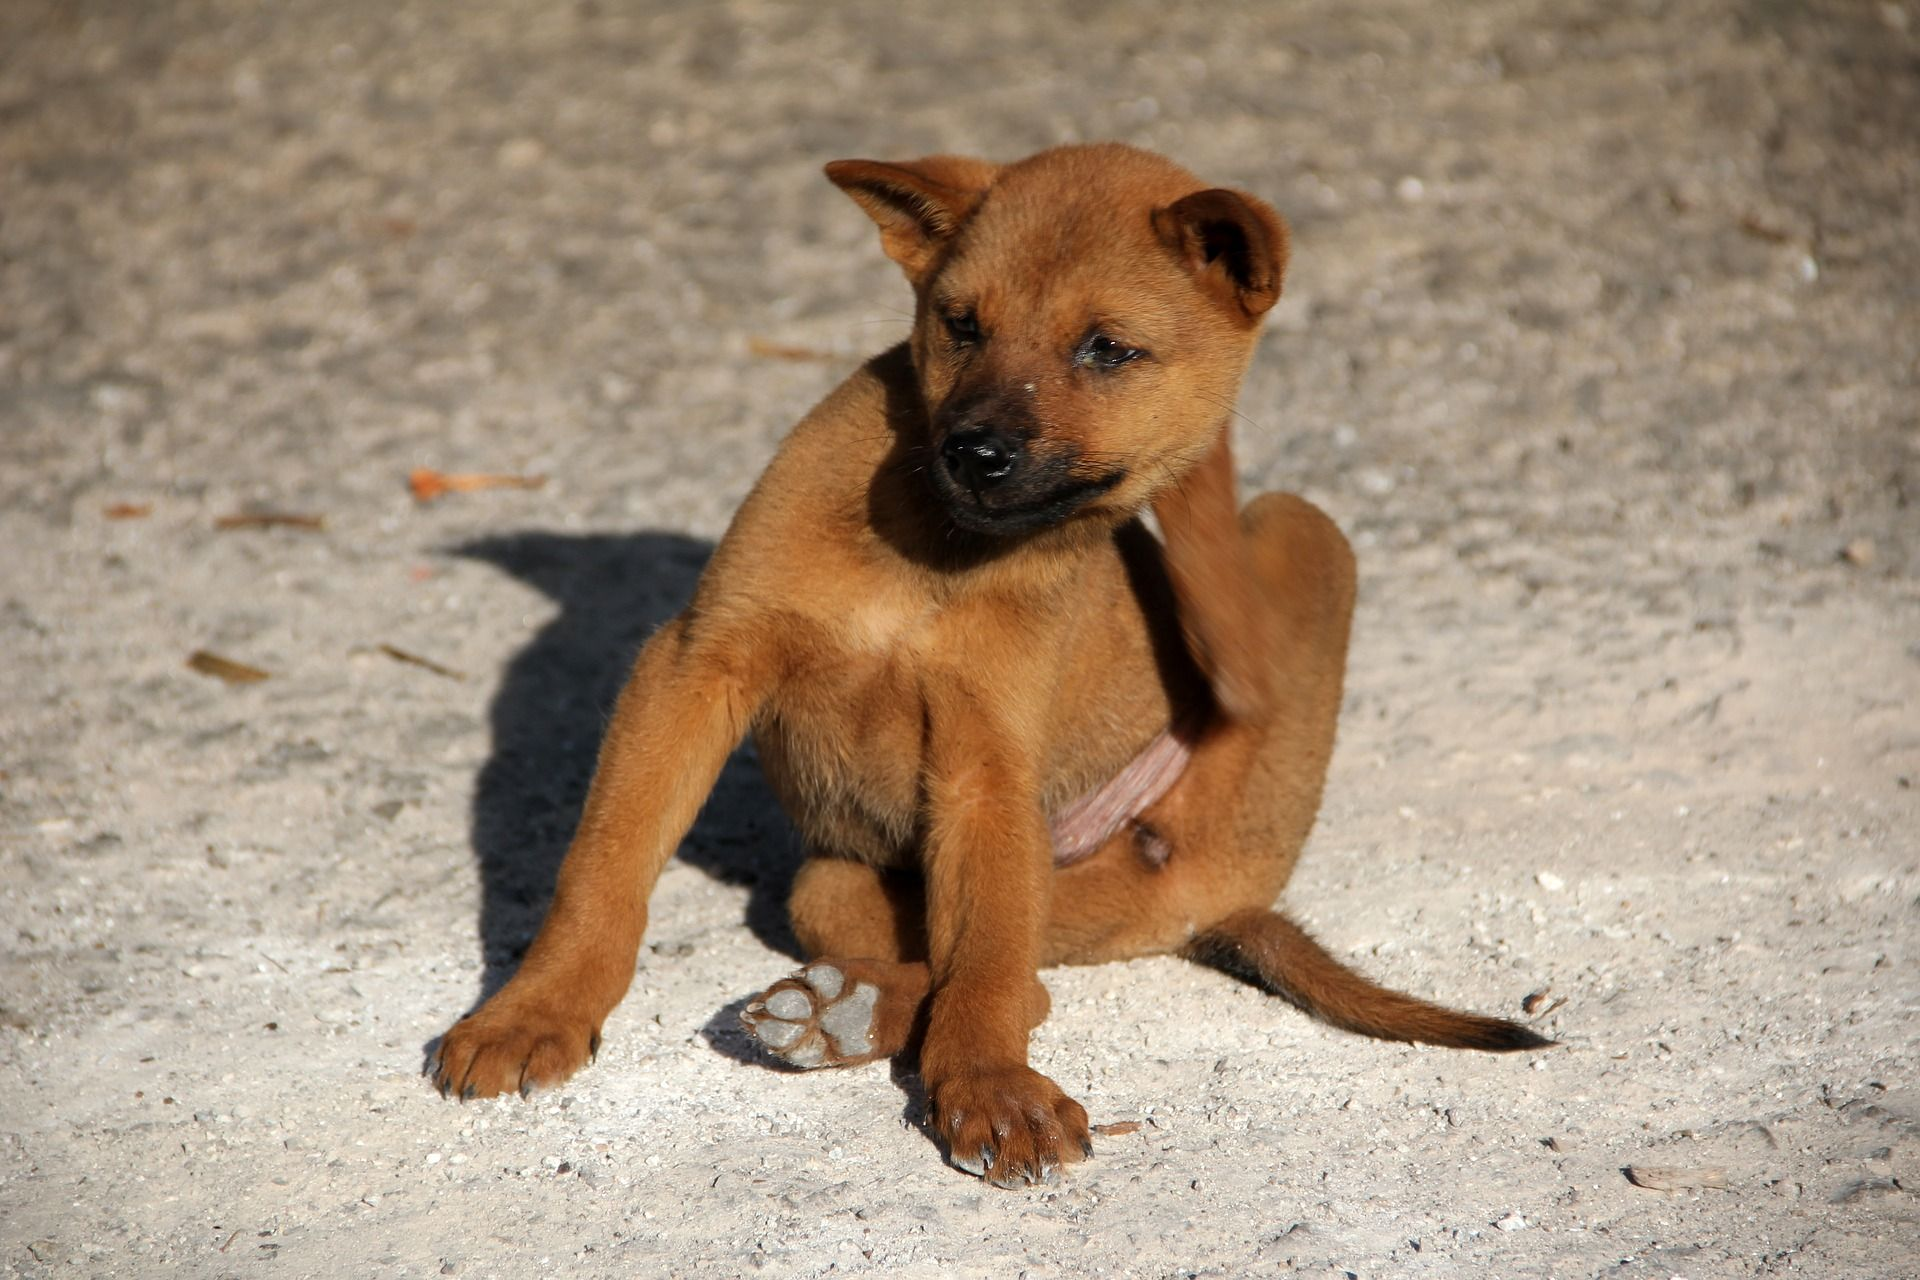 dog-1559746_1920-1.jpg